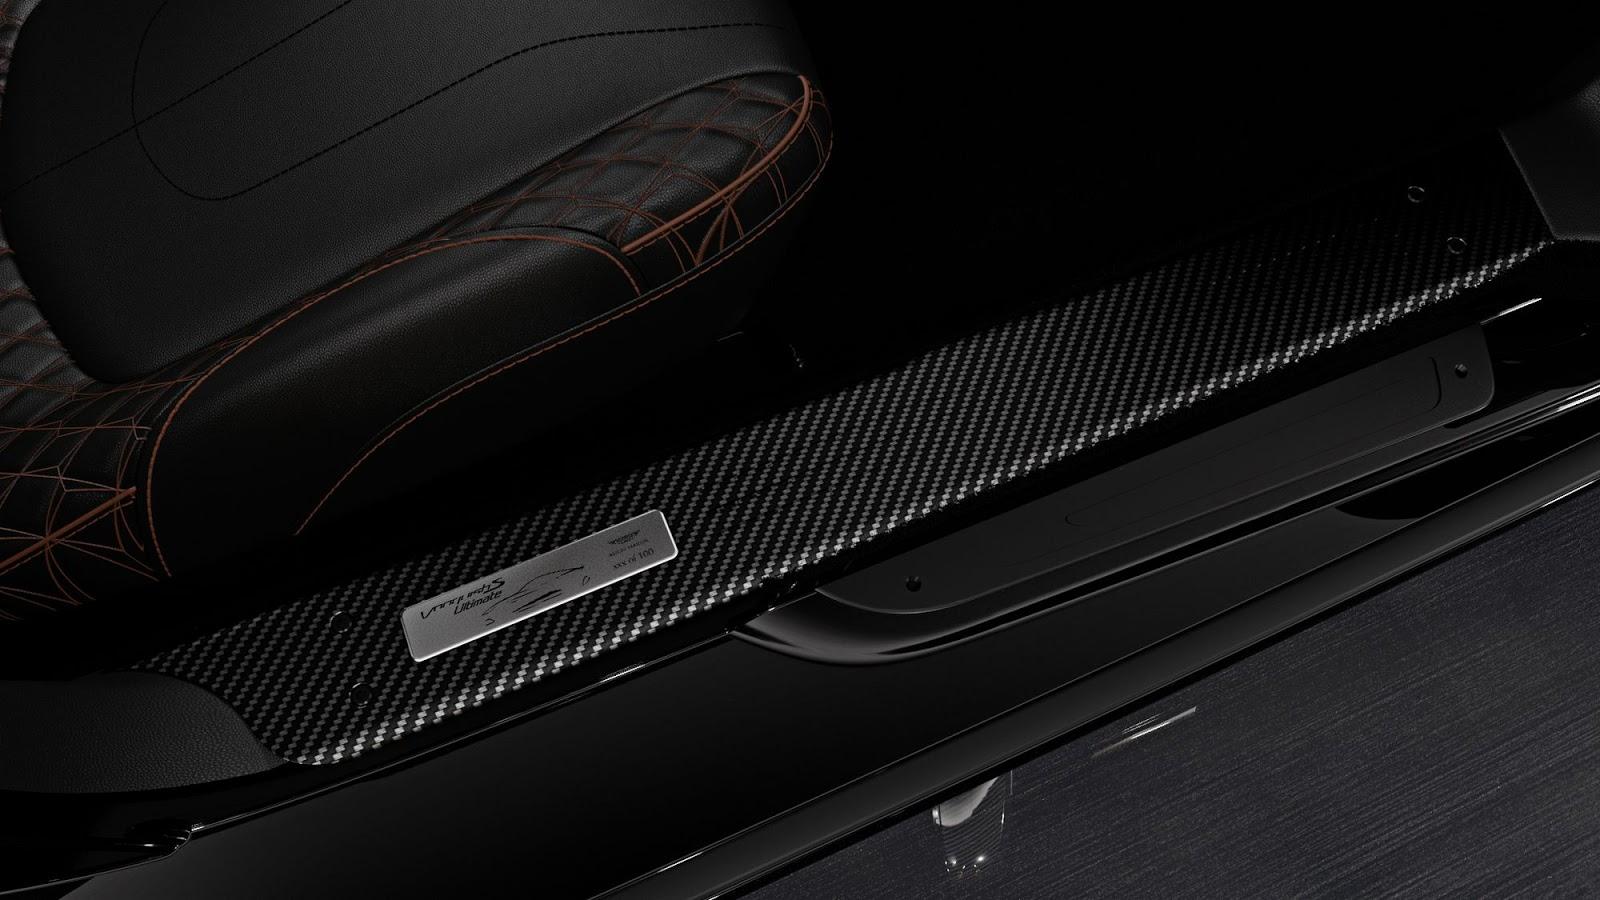 Aston-Martin-Vanquish-S-Ultimate-5